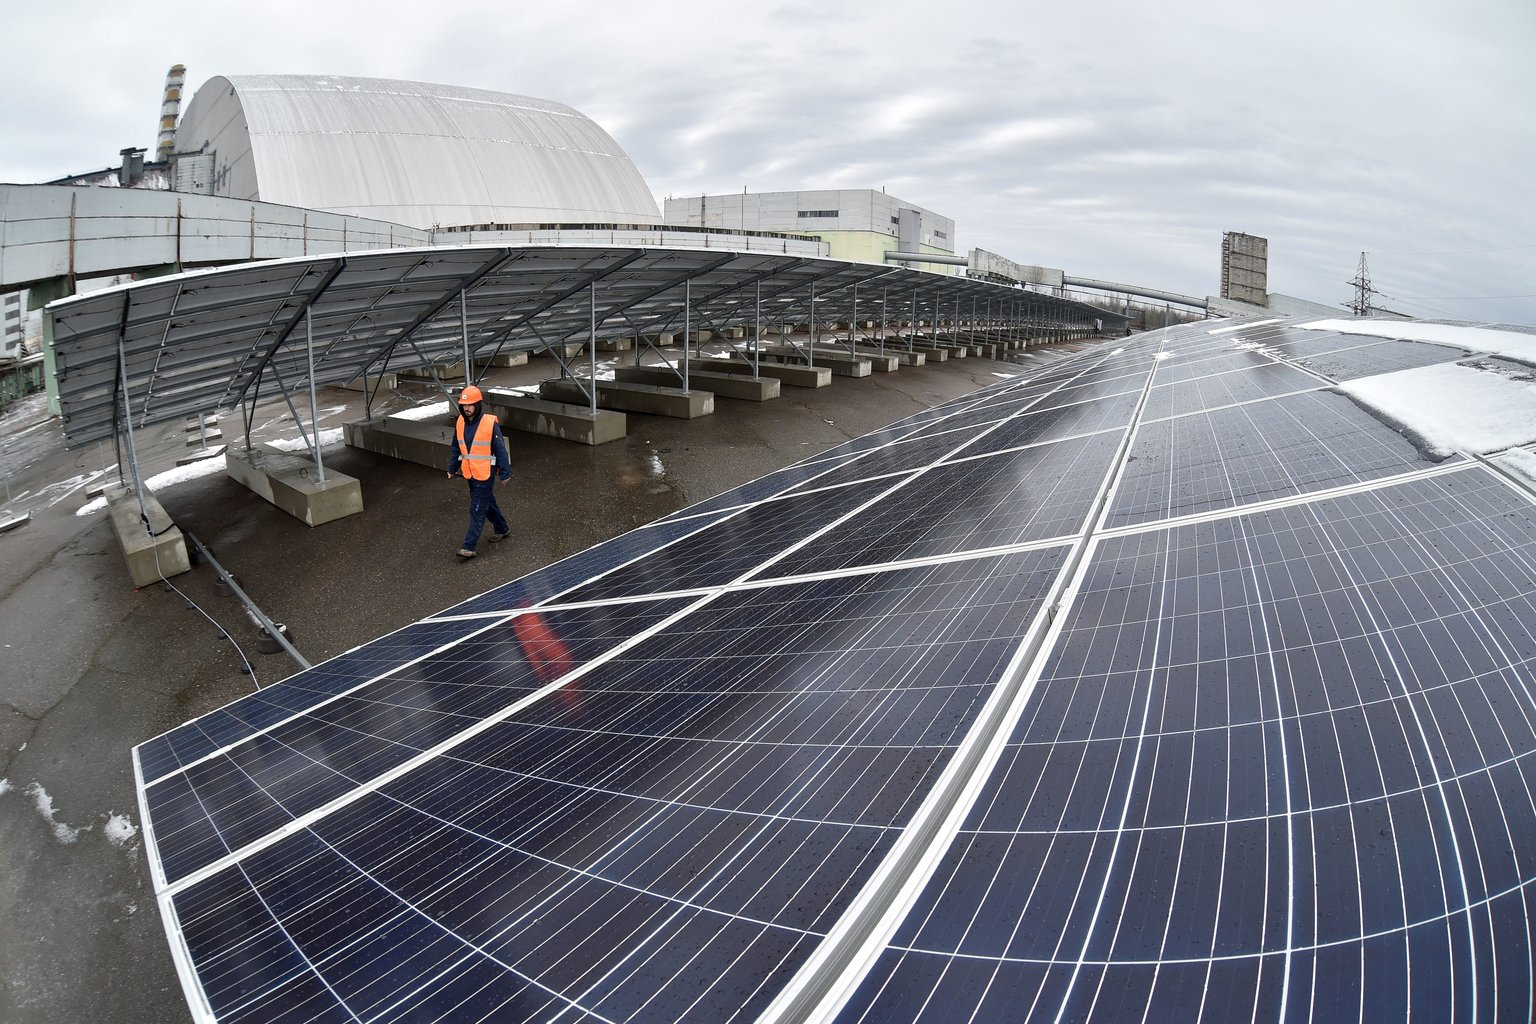 Chernobyl logo estará gerando energia solar